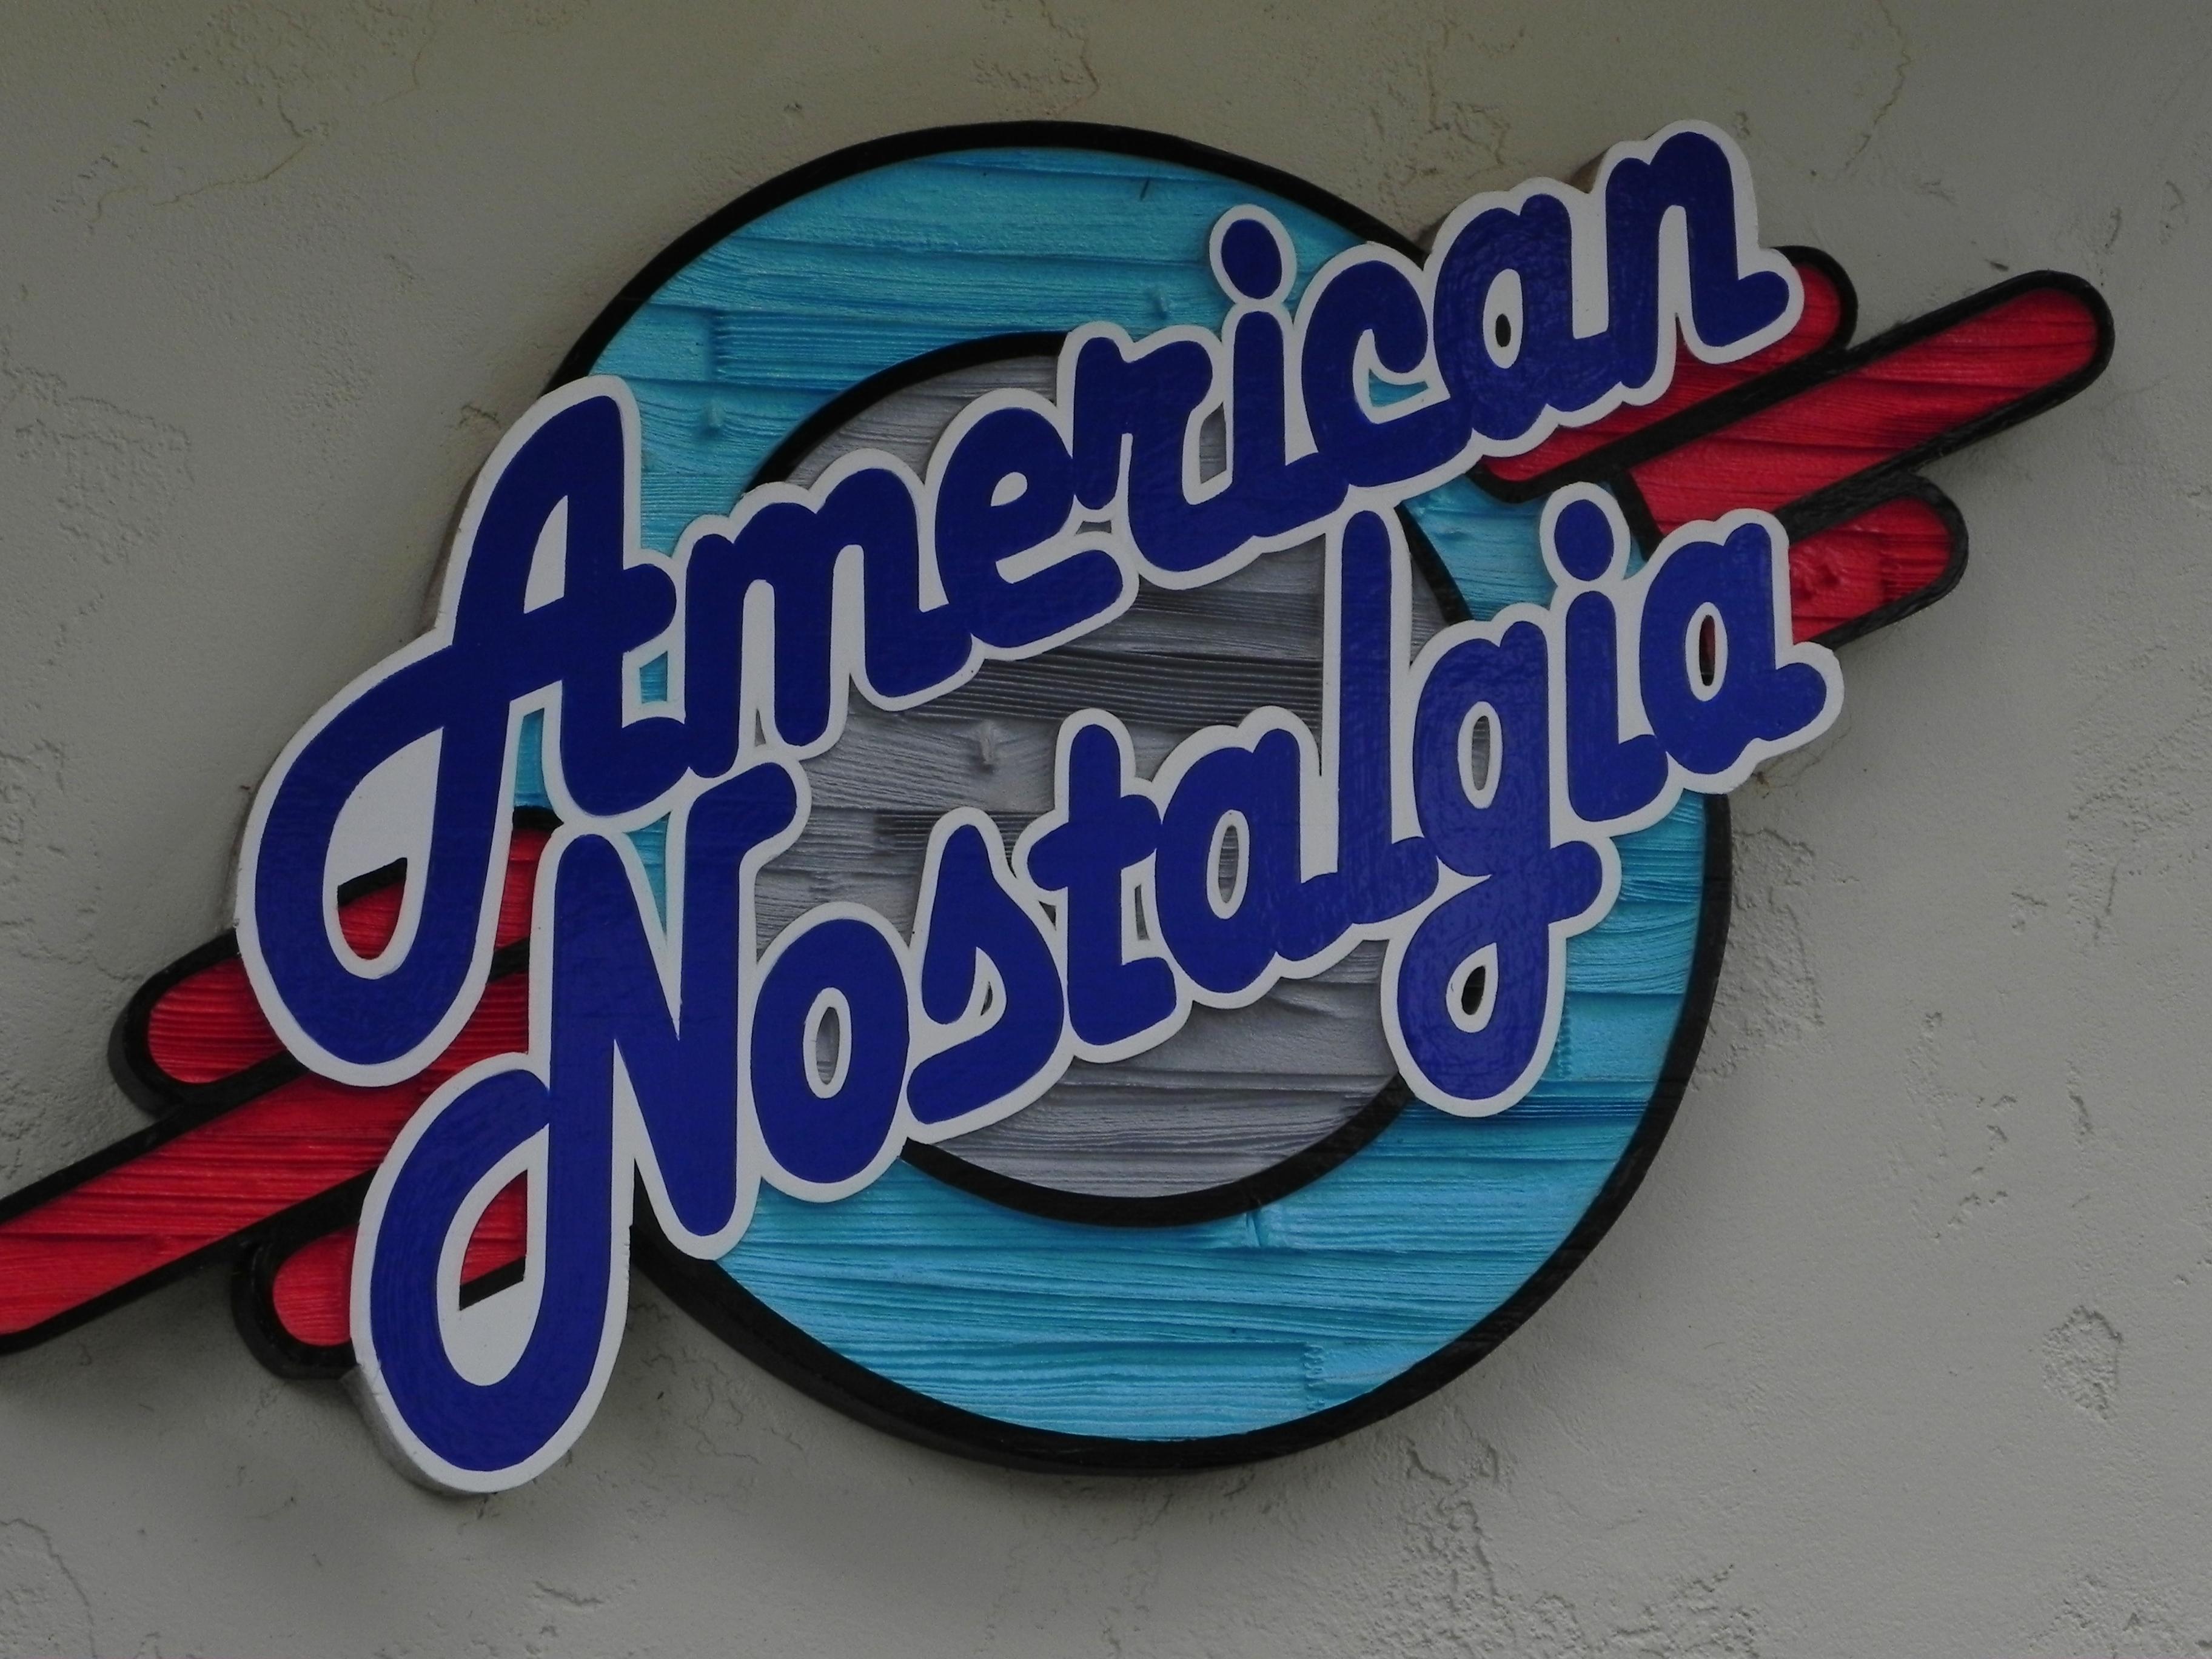 American Nostalgia